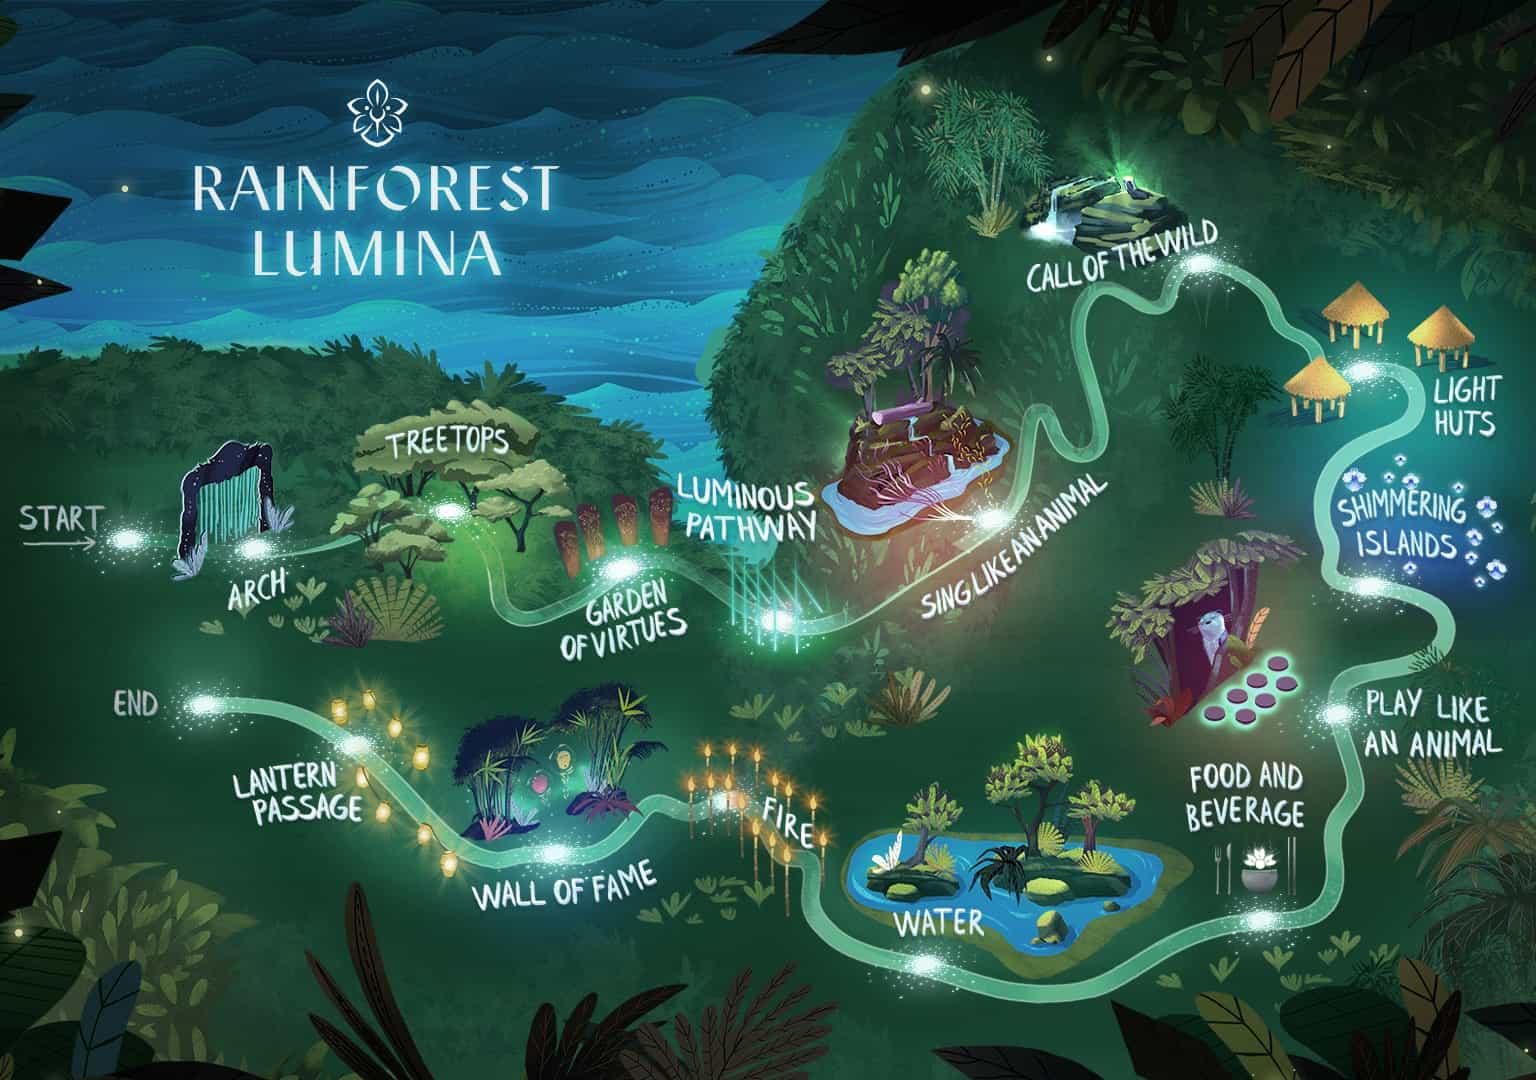 Lumina Rain Forest Wisata Baru Di Singapore 2018 Tiket Masuk Garden By The Bay Anak